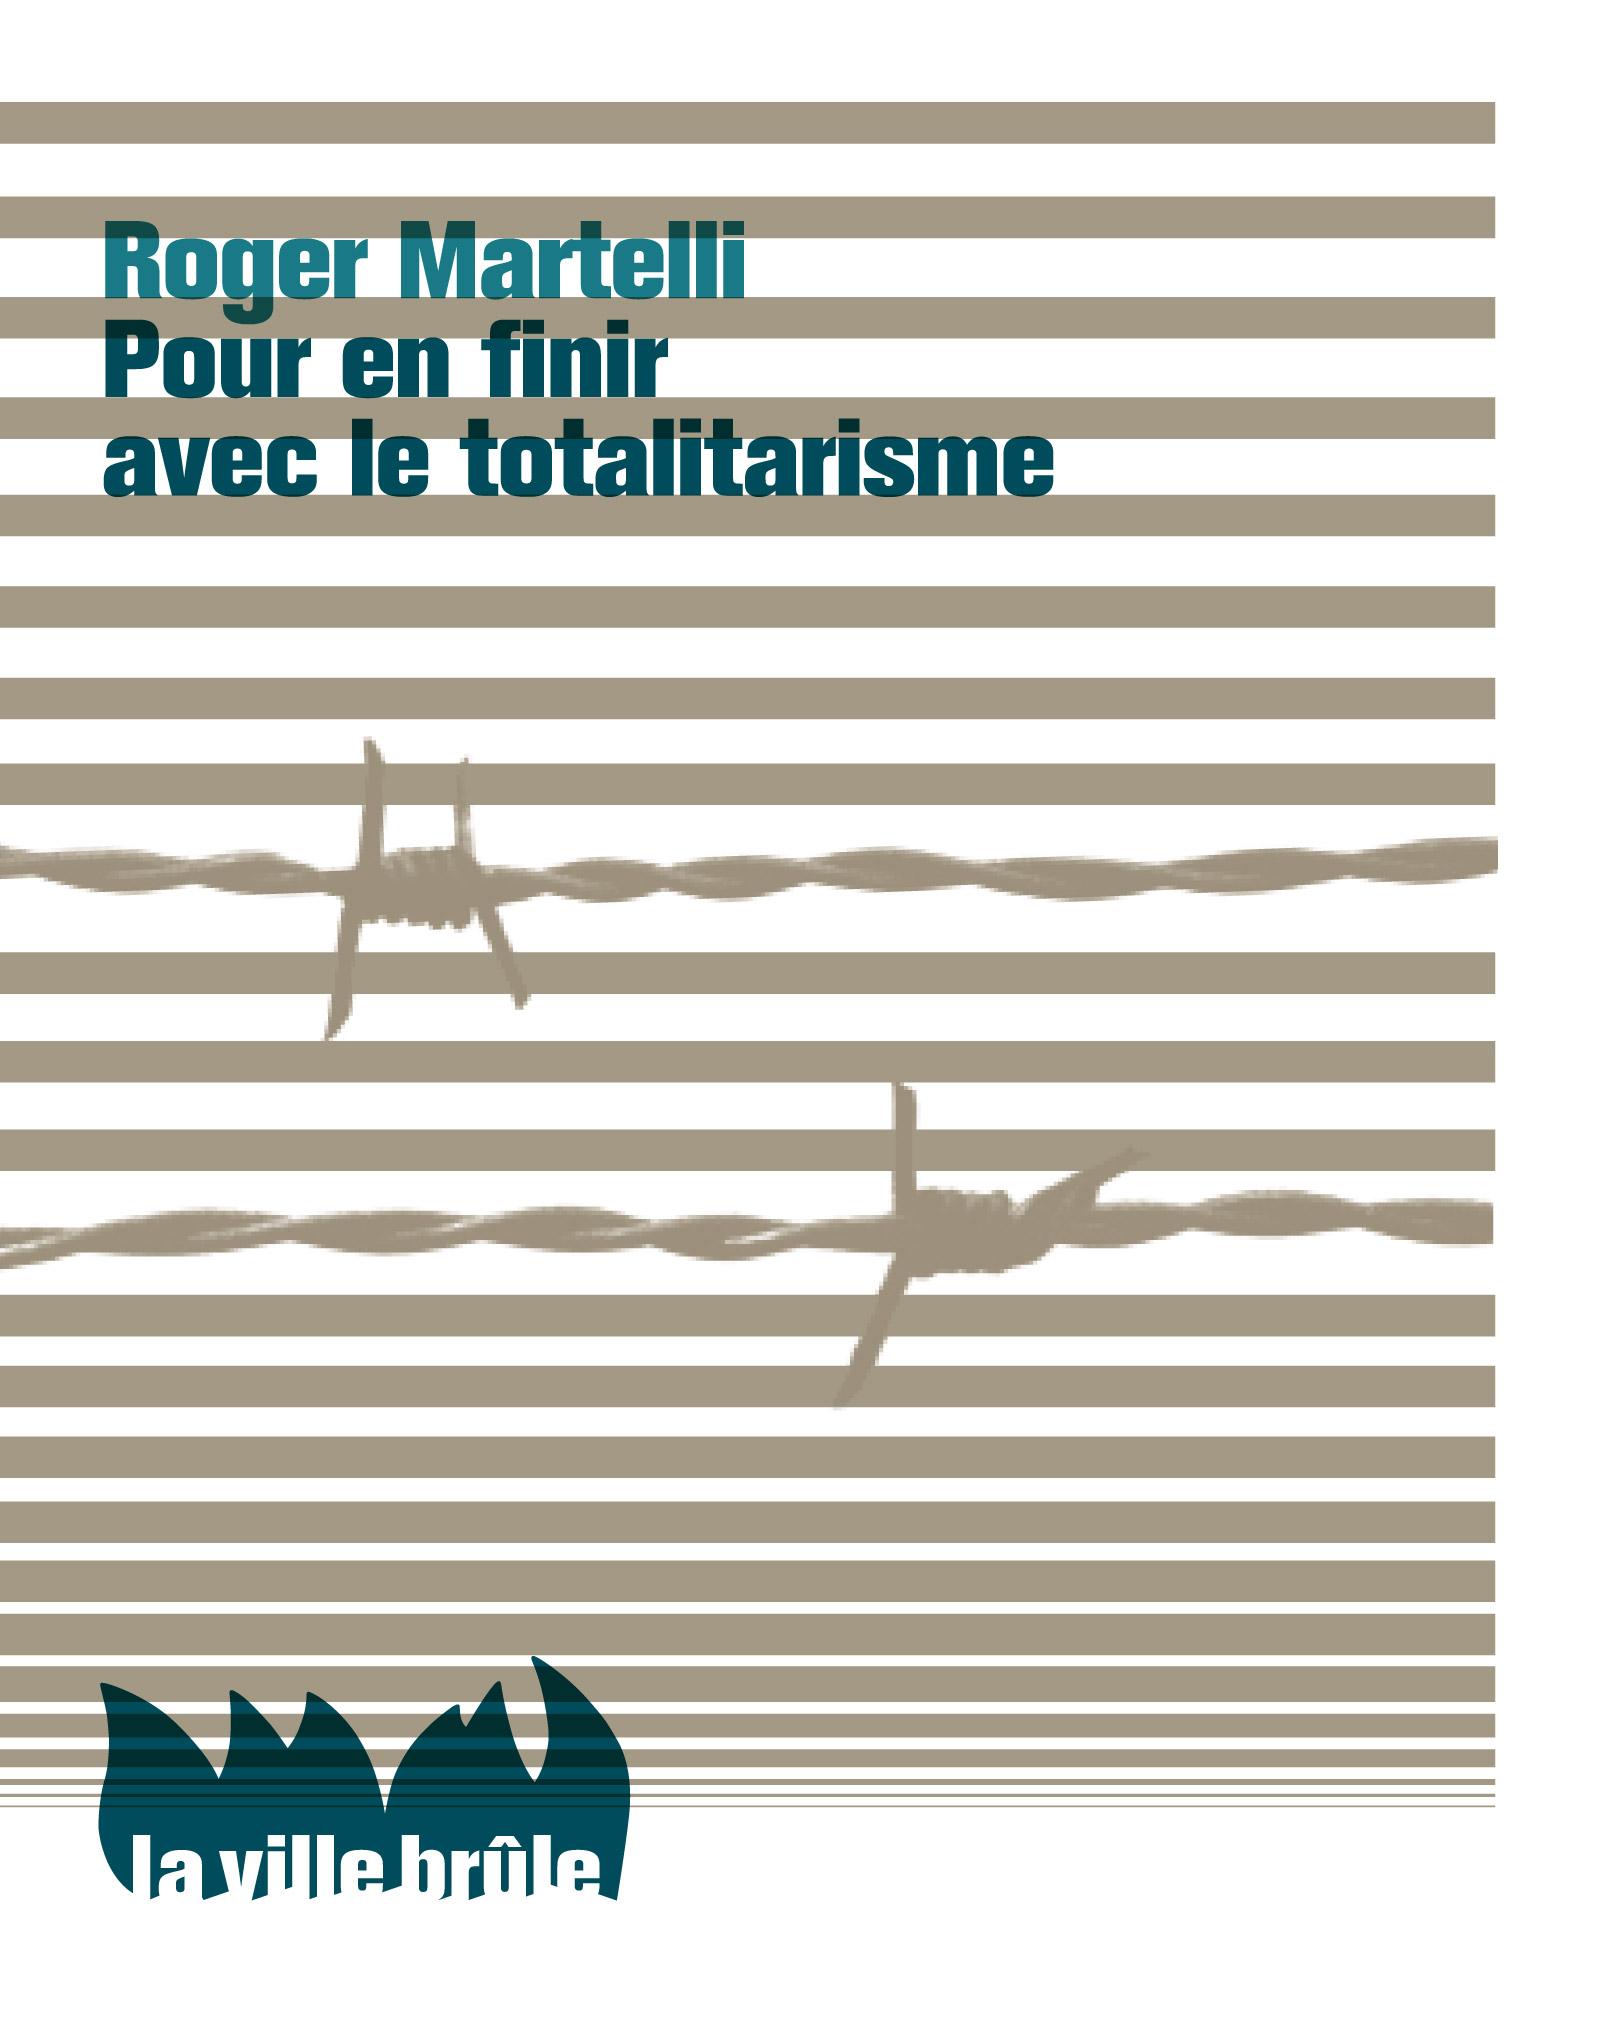 Finir totalitarisme Martelli Bibliolingus